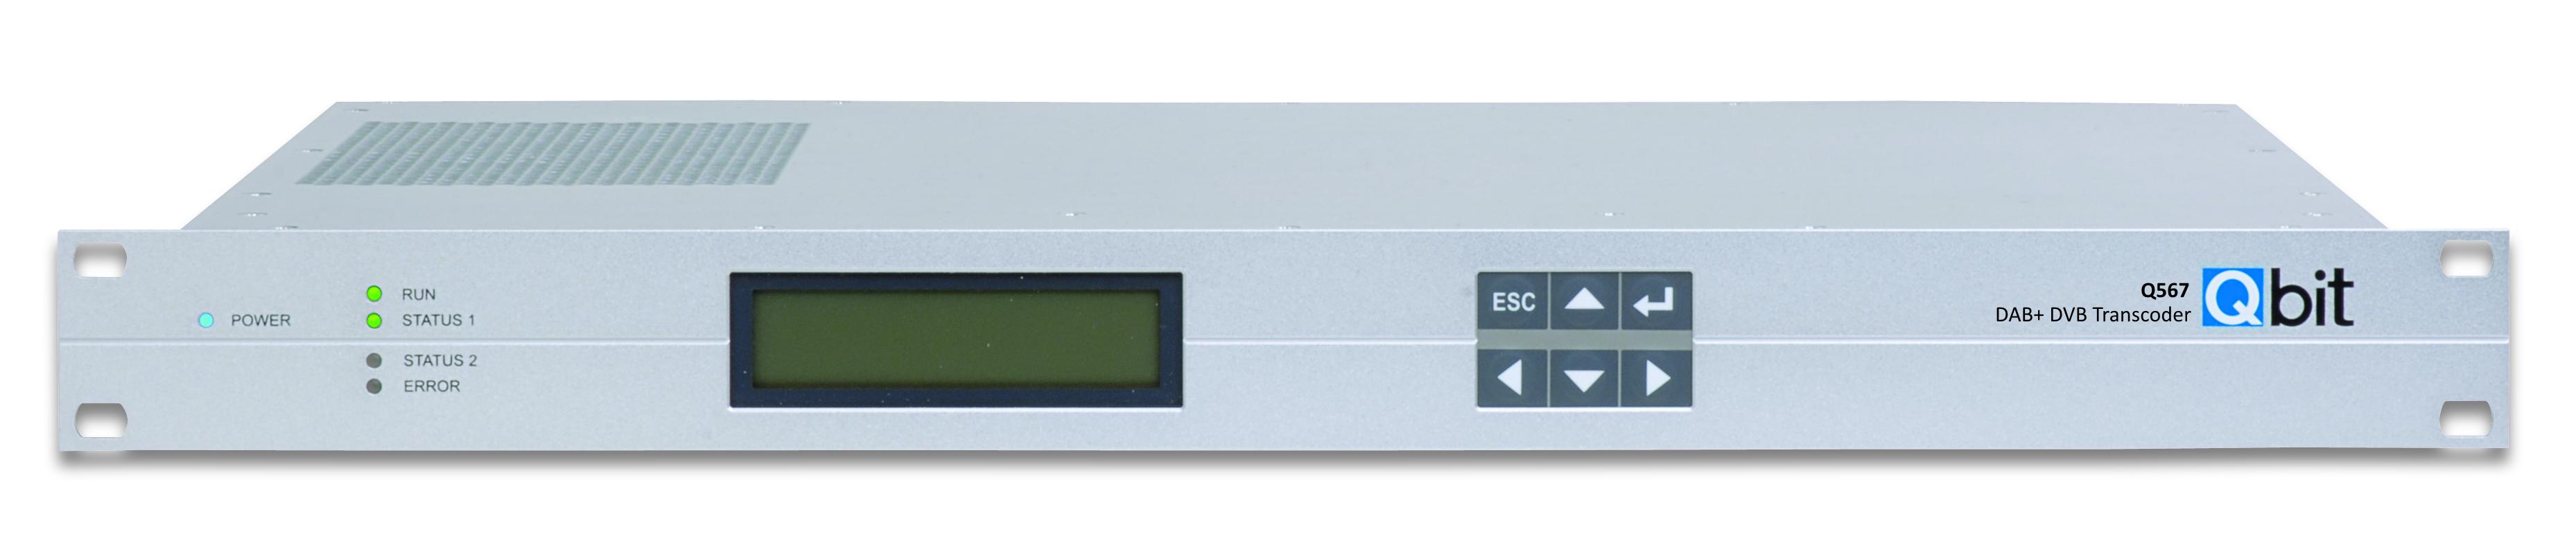 Qbit DAB+ DVB Transcoder